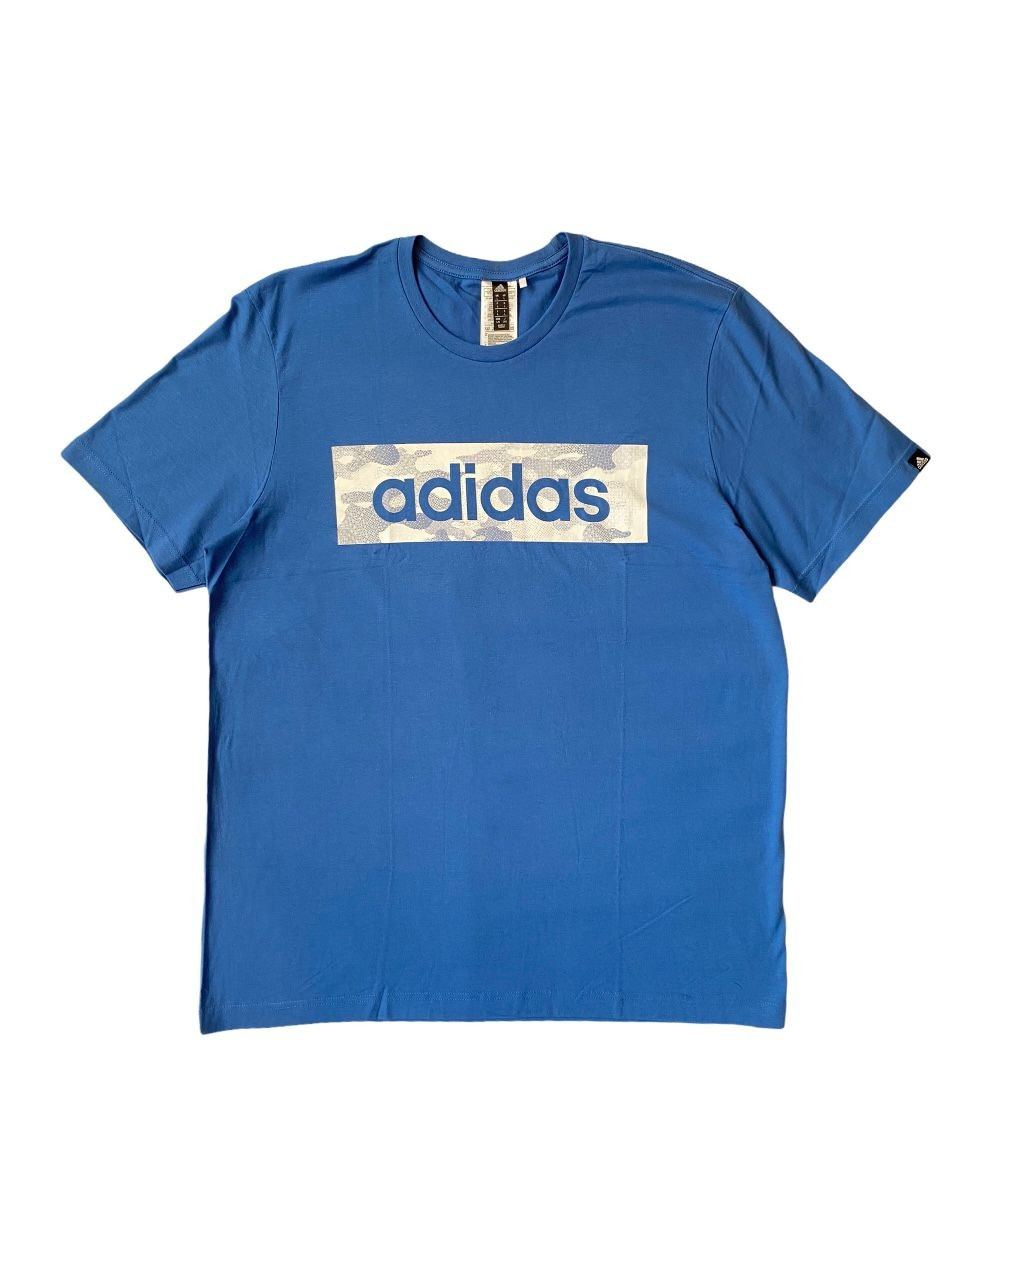 A. Printed Blue T Shirt